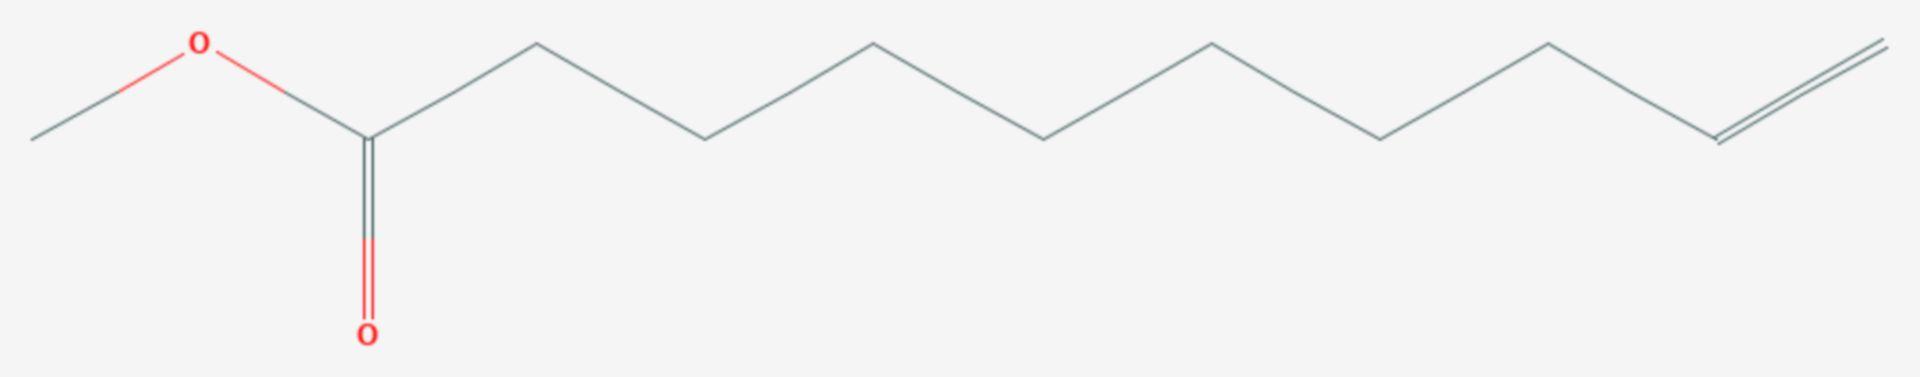 Methyl-9-decenoat (Strukturformel)